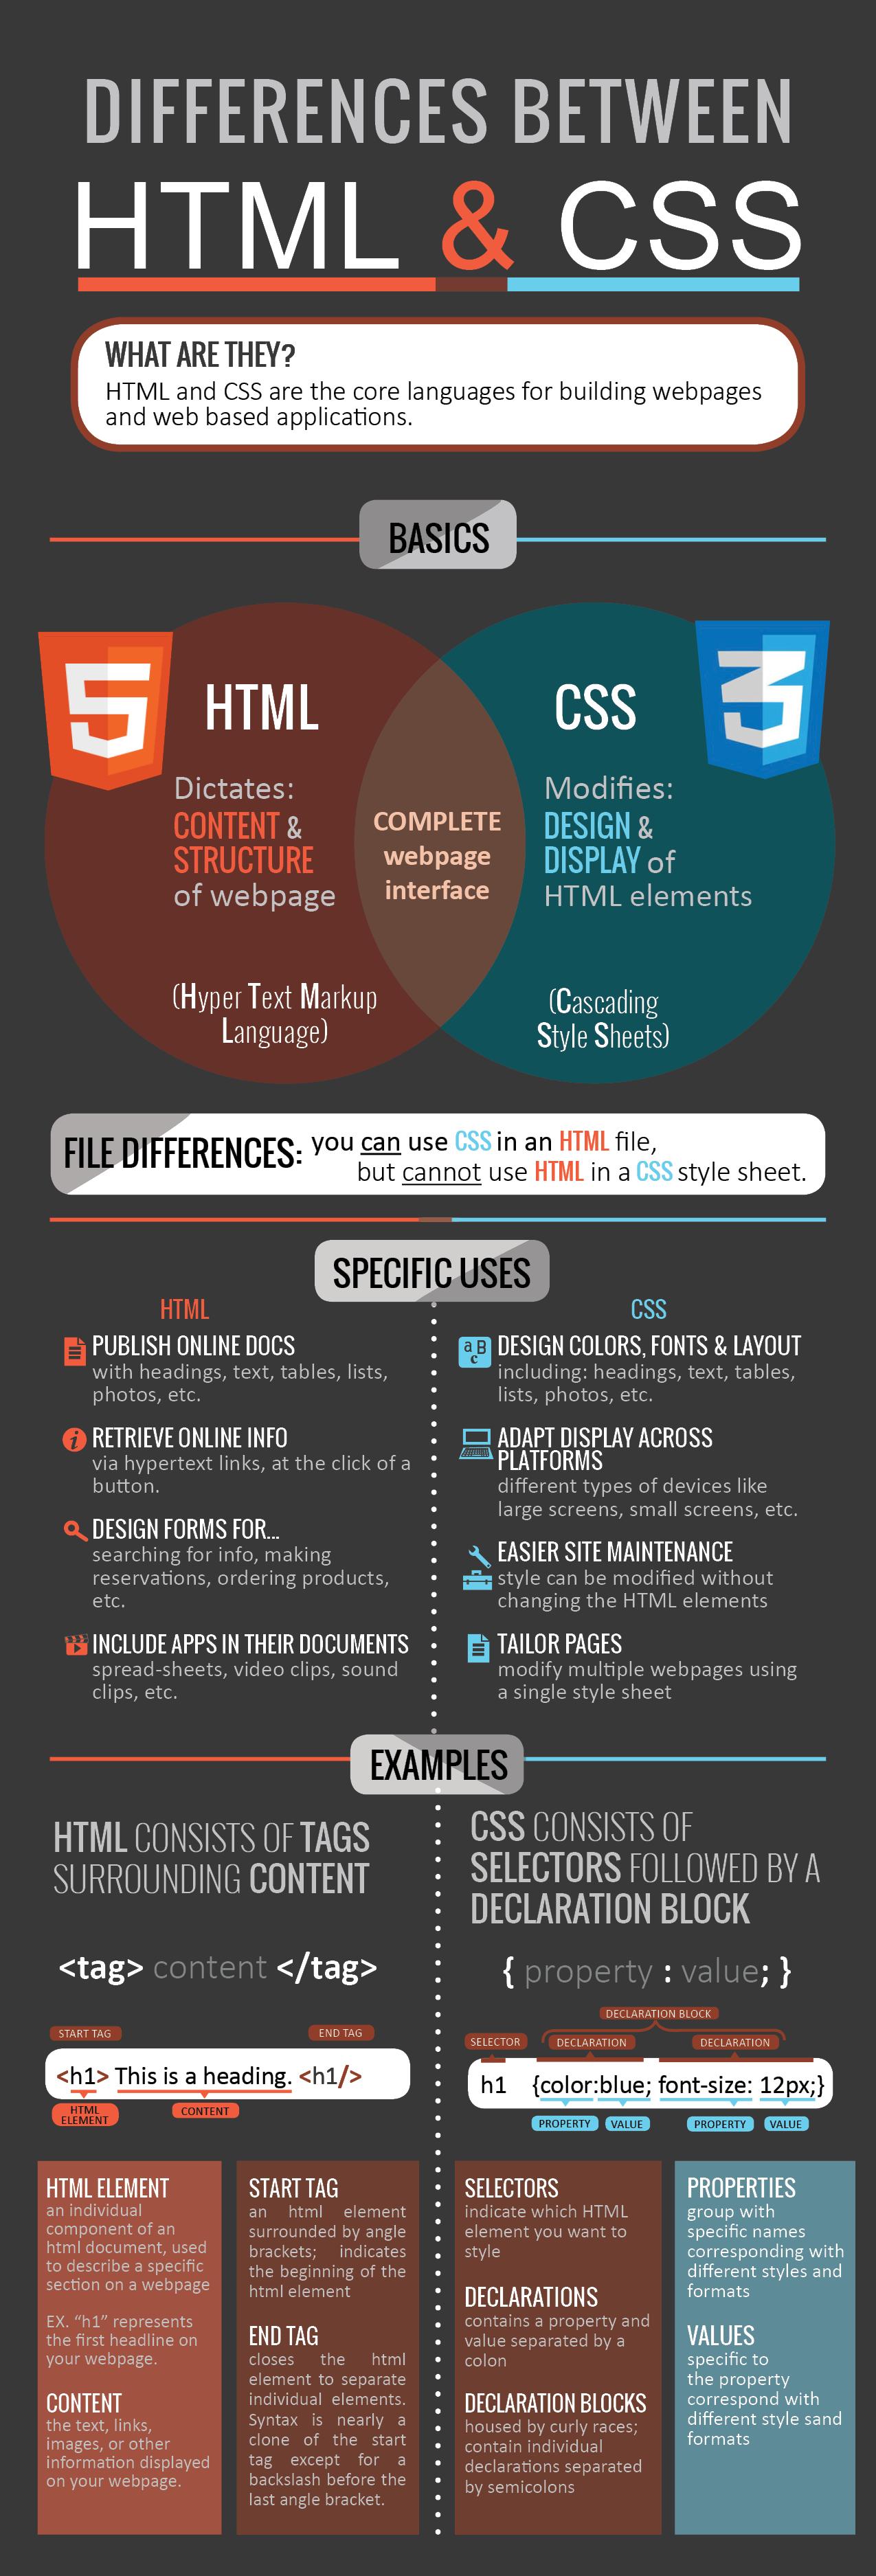 Web Developer Vs Web Designer